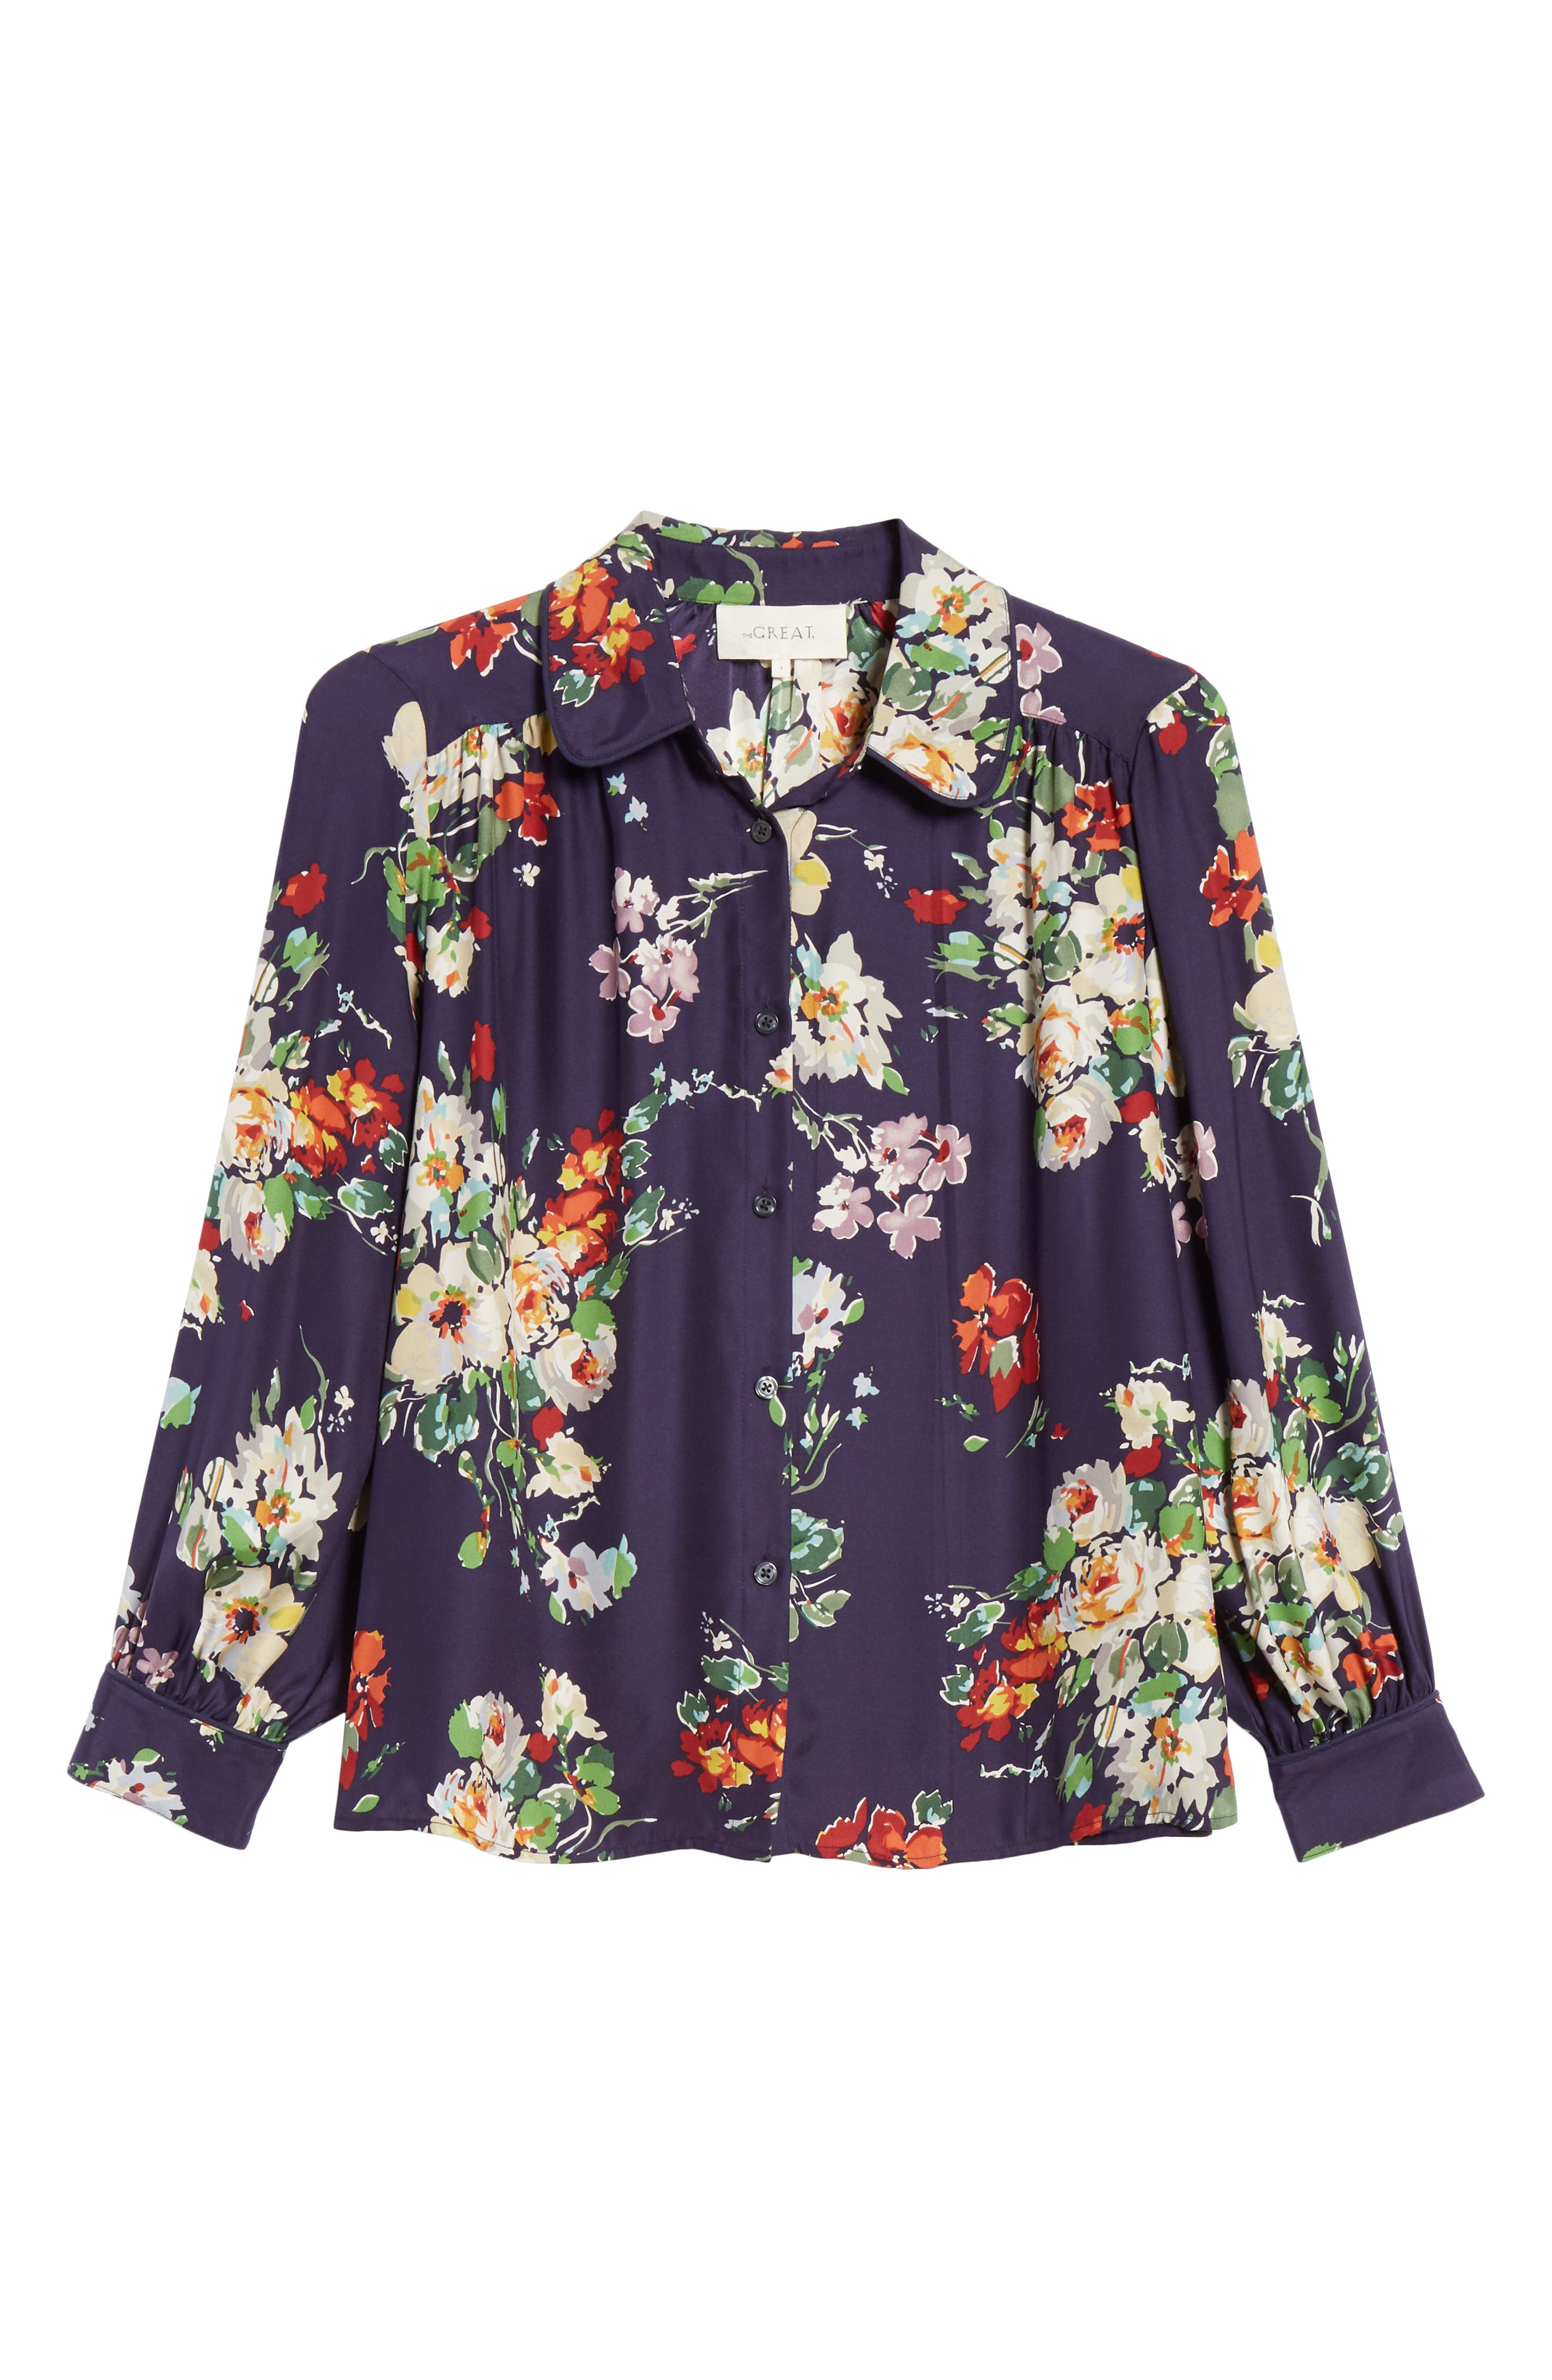 Floral Silk Blouse,                             Alternate thumbnail 6, color,                             NIGHTFALL FLORAL PRINT